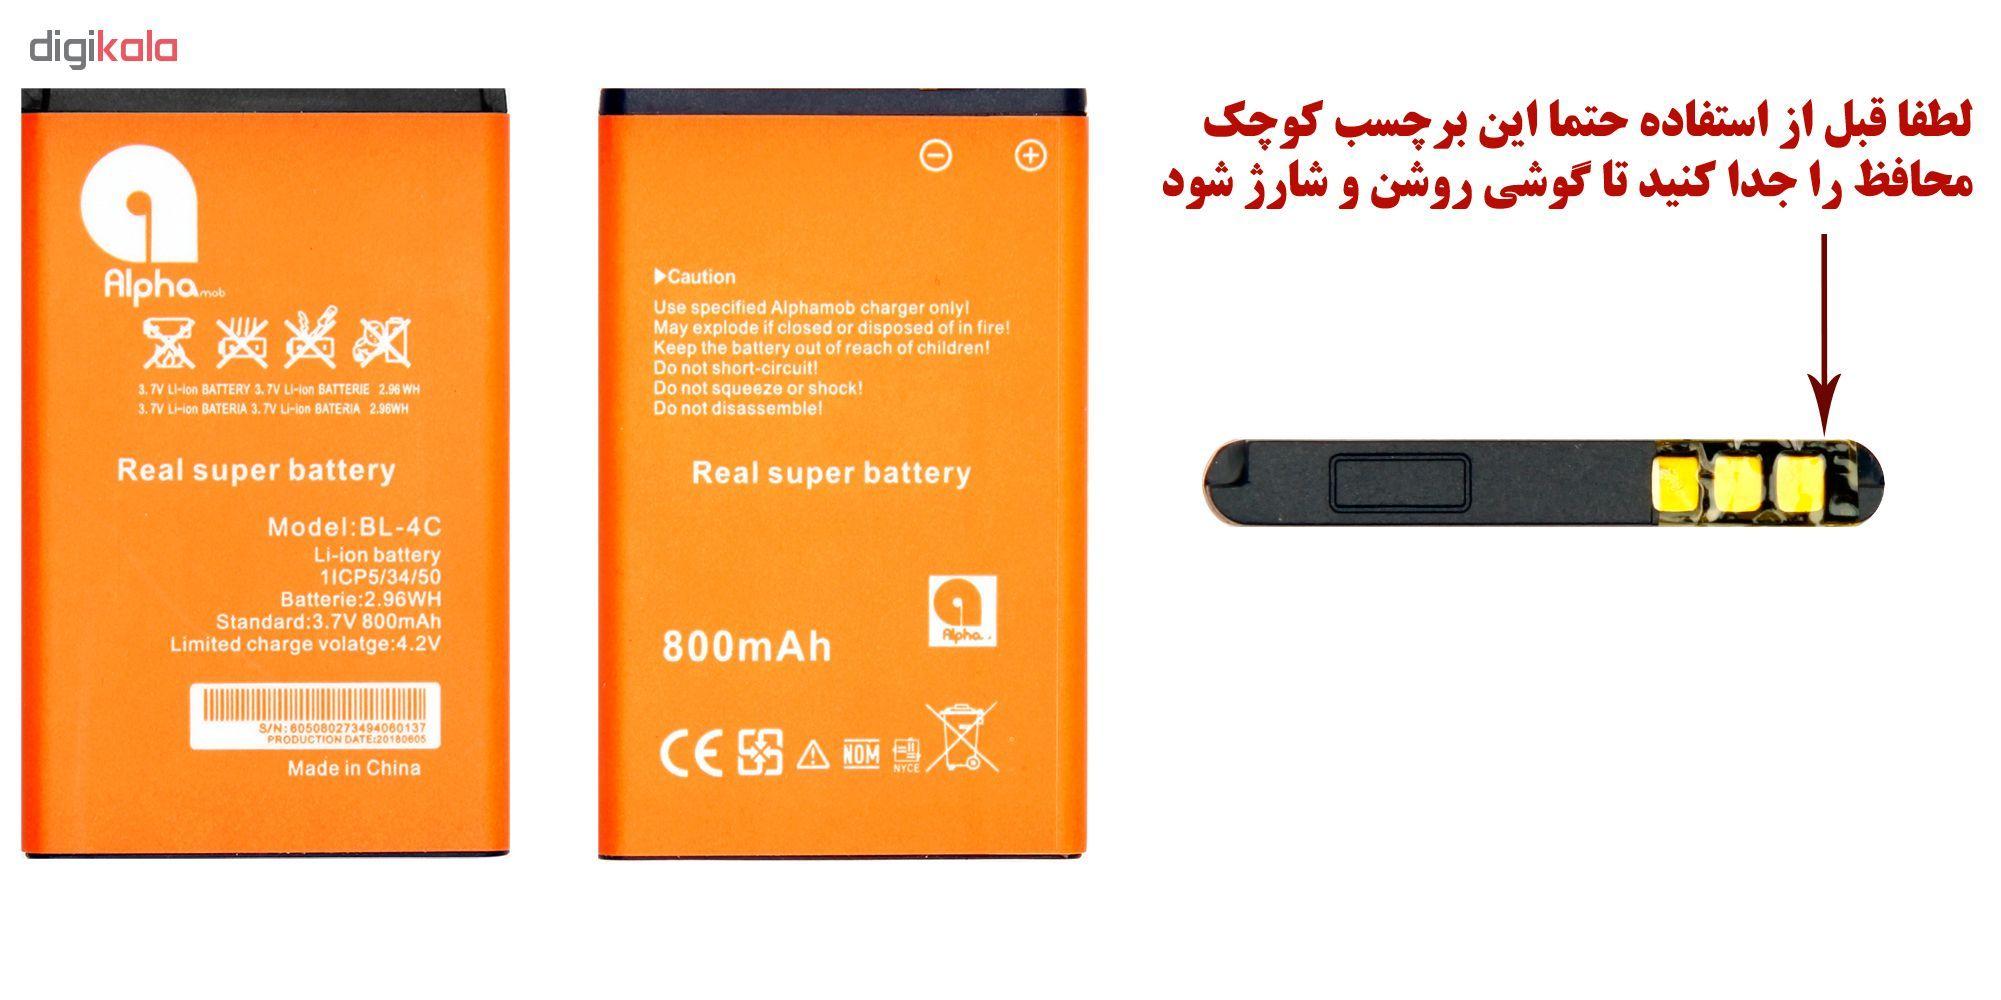 گوشی موبایل آلفاموب مدل x9 دو سیم کارت main 1 6